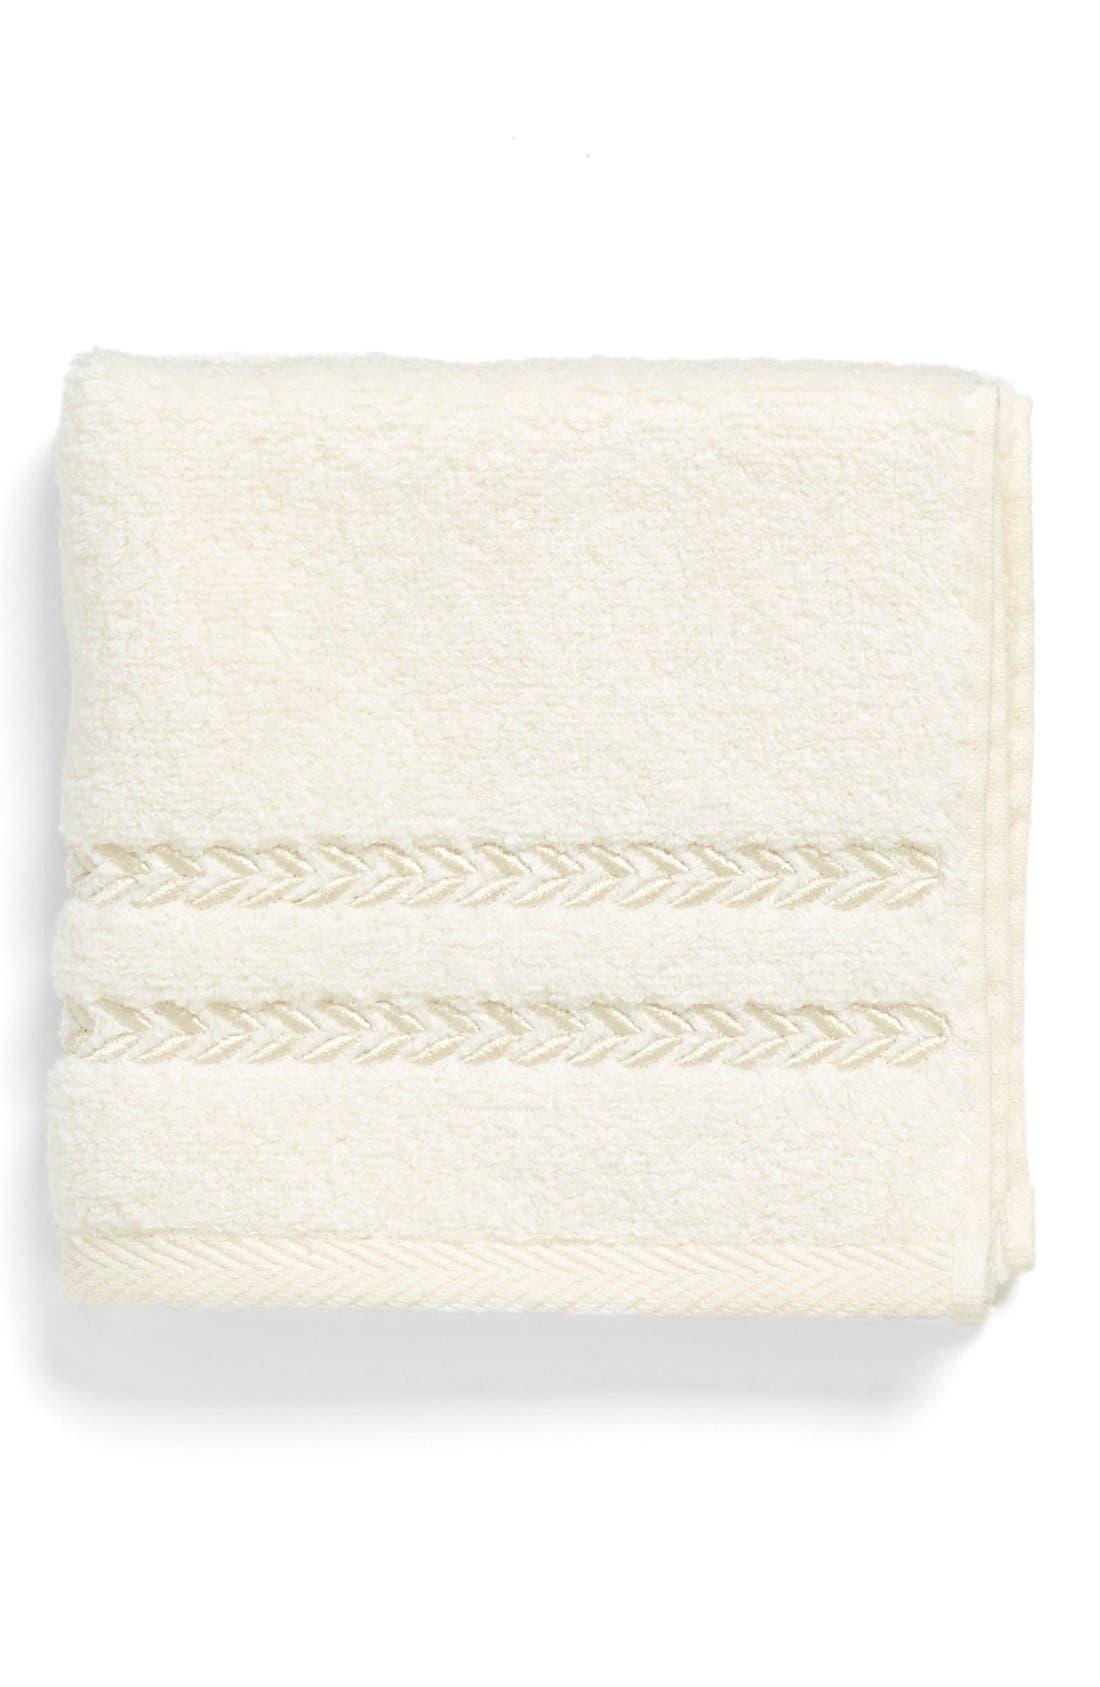 'Pearl Essence' Wash Towel,                             Main thumbnail 8, color,